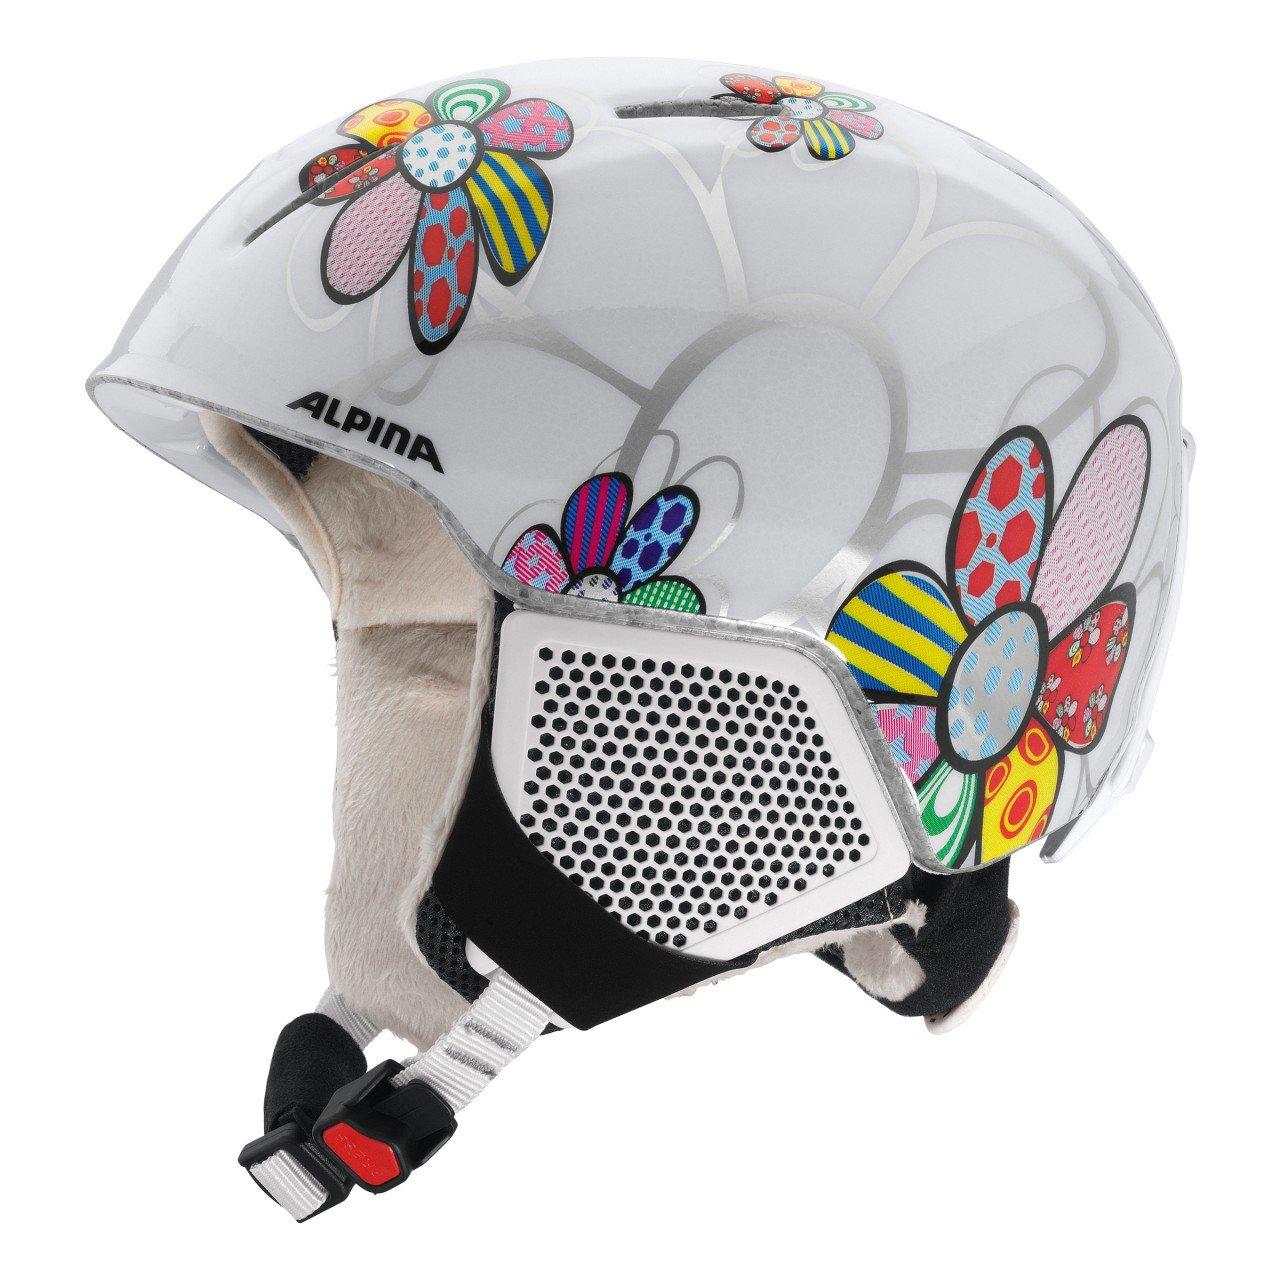 ALPINA Unisex - Kinder, CARAT LX Skihelm, patchwork-flower, 54-58 cm